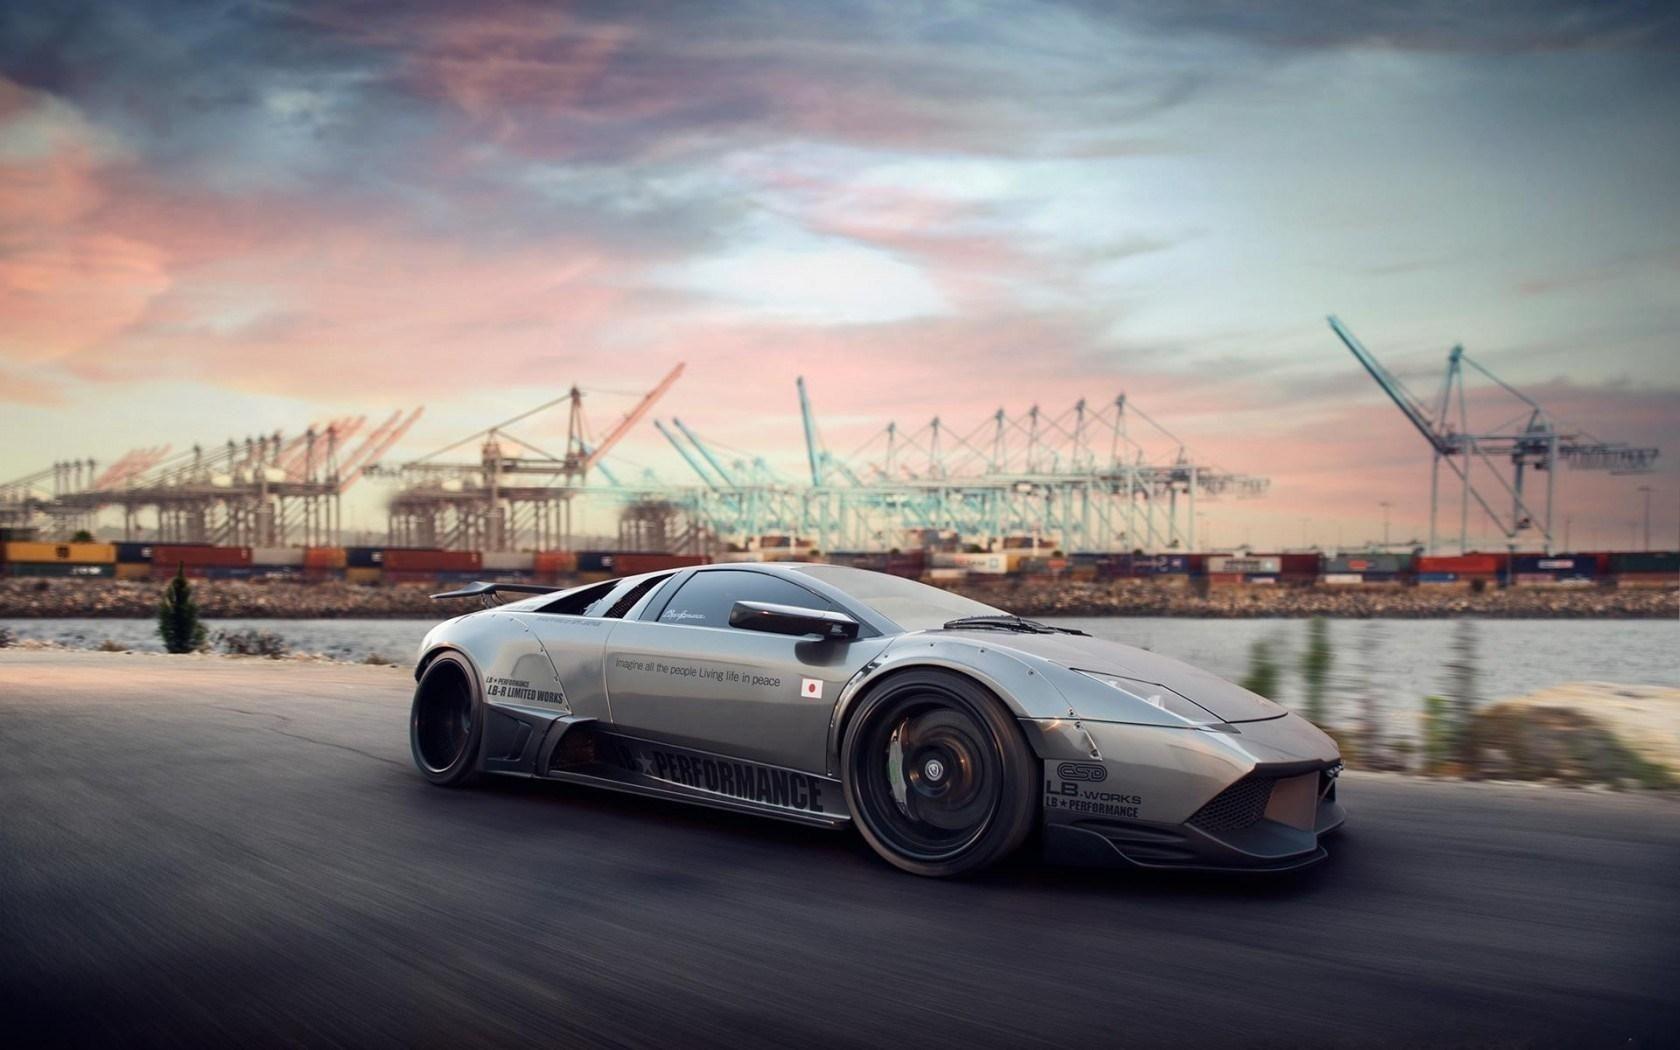 Speed Port Lamborghini Murcielago Hd Wallpaper Cars 2025 Lamborghini Murcielago Lamborghini Super Cars